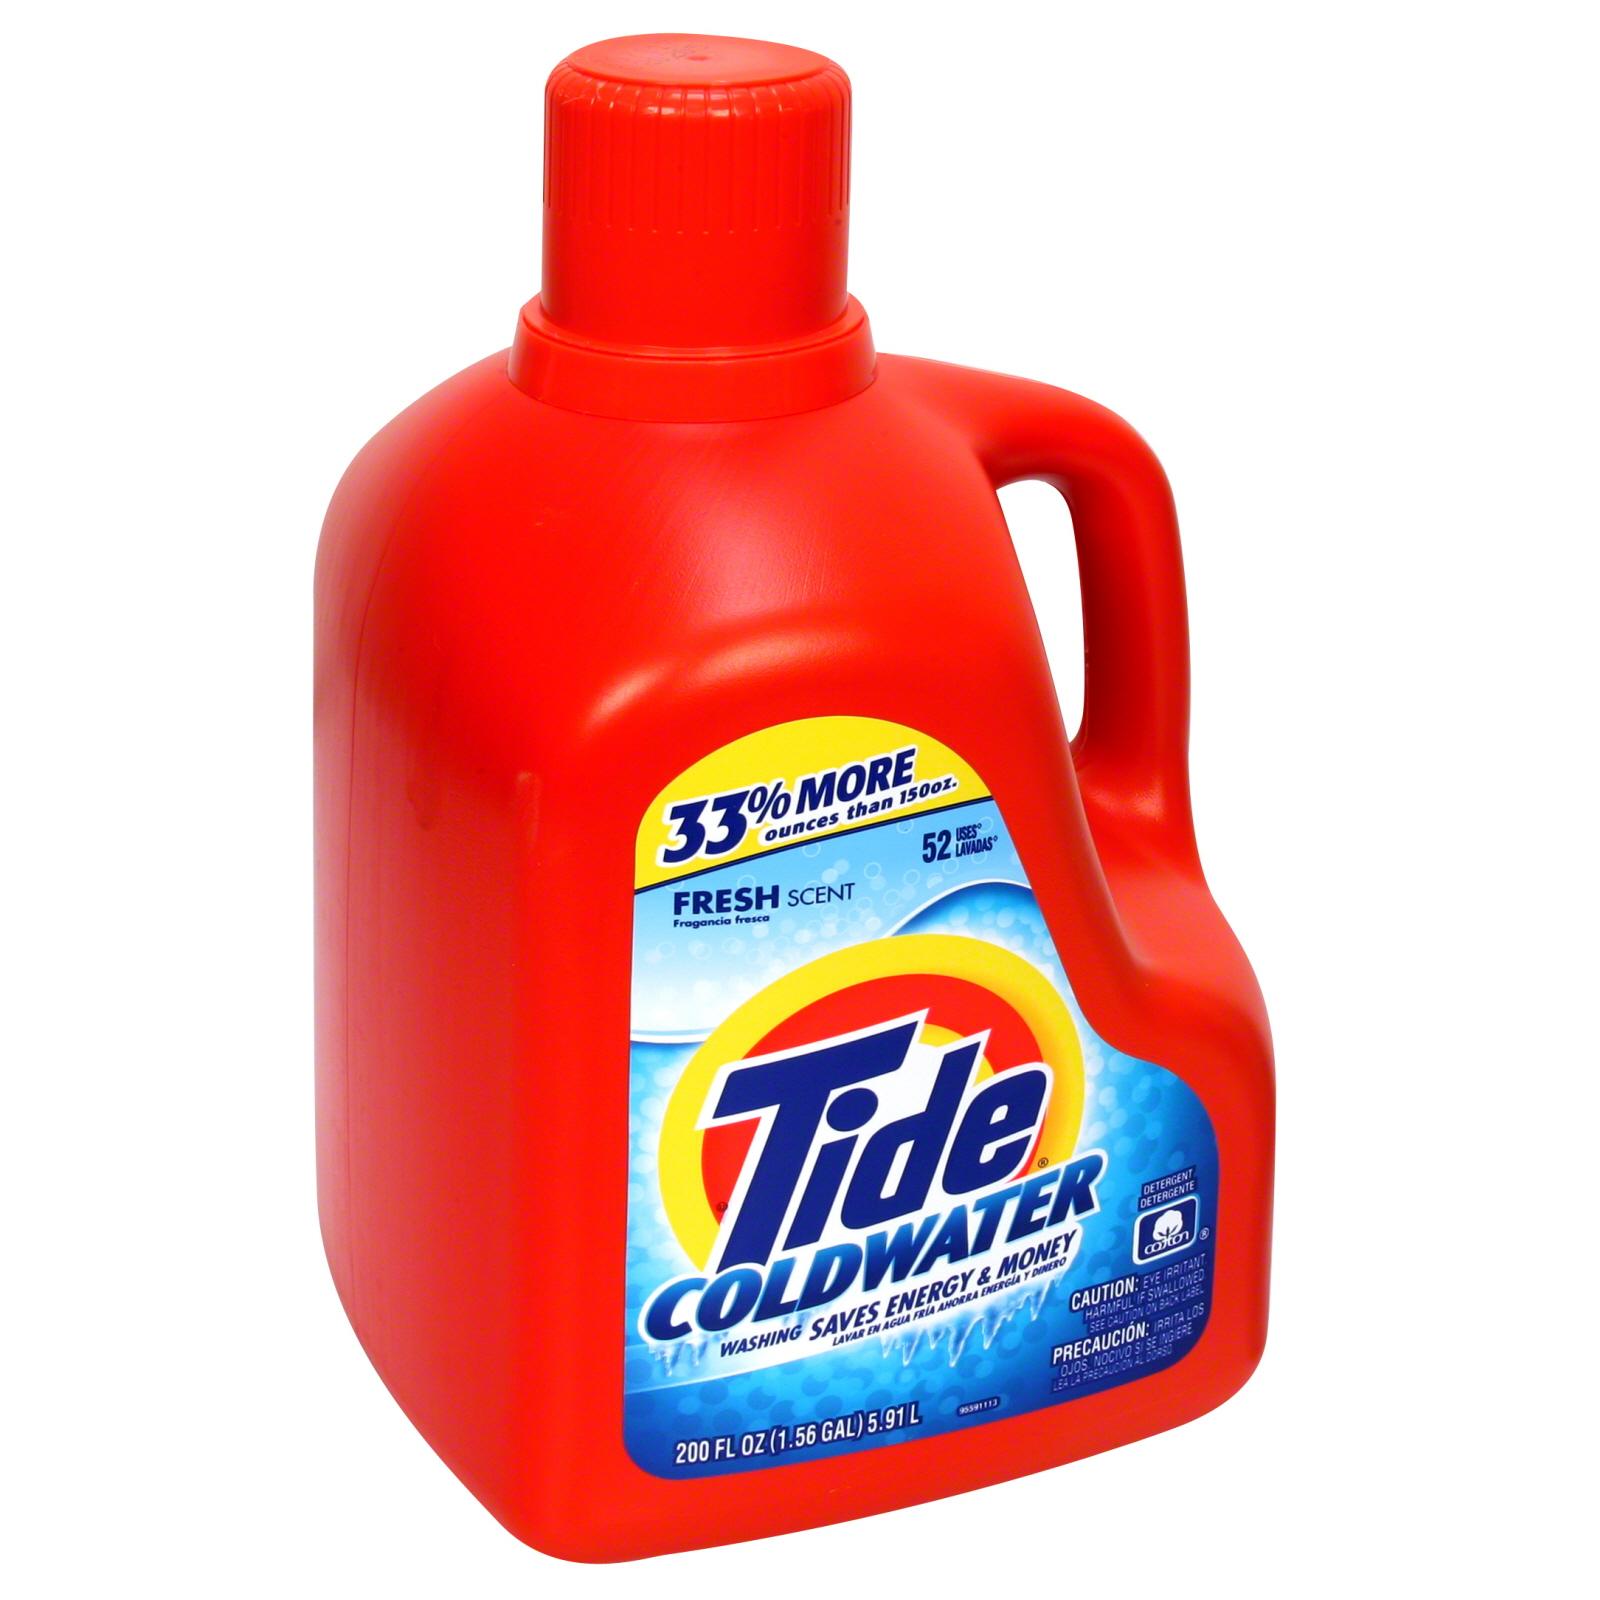 Tide Coldwater Detergent, Fresh Scent Laundry Detergent